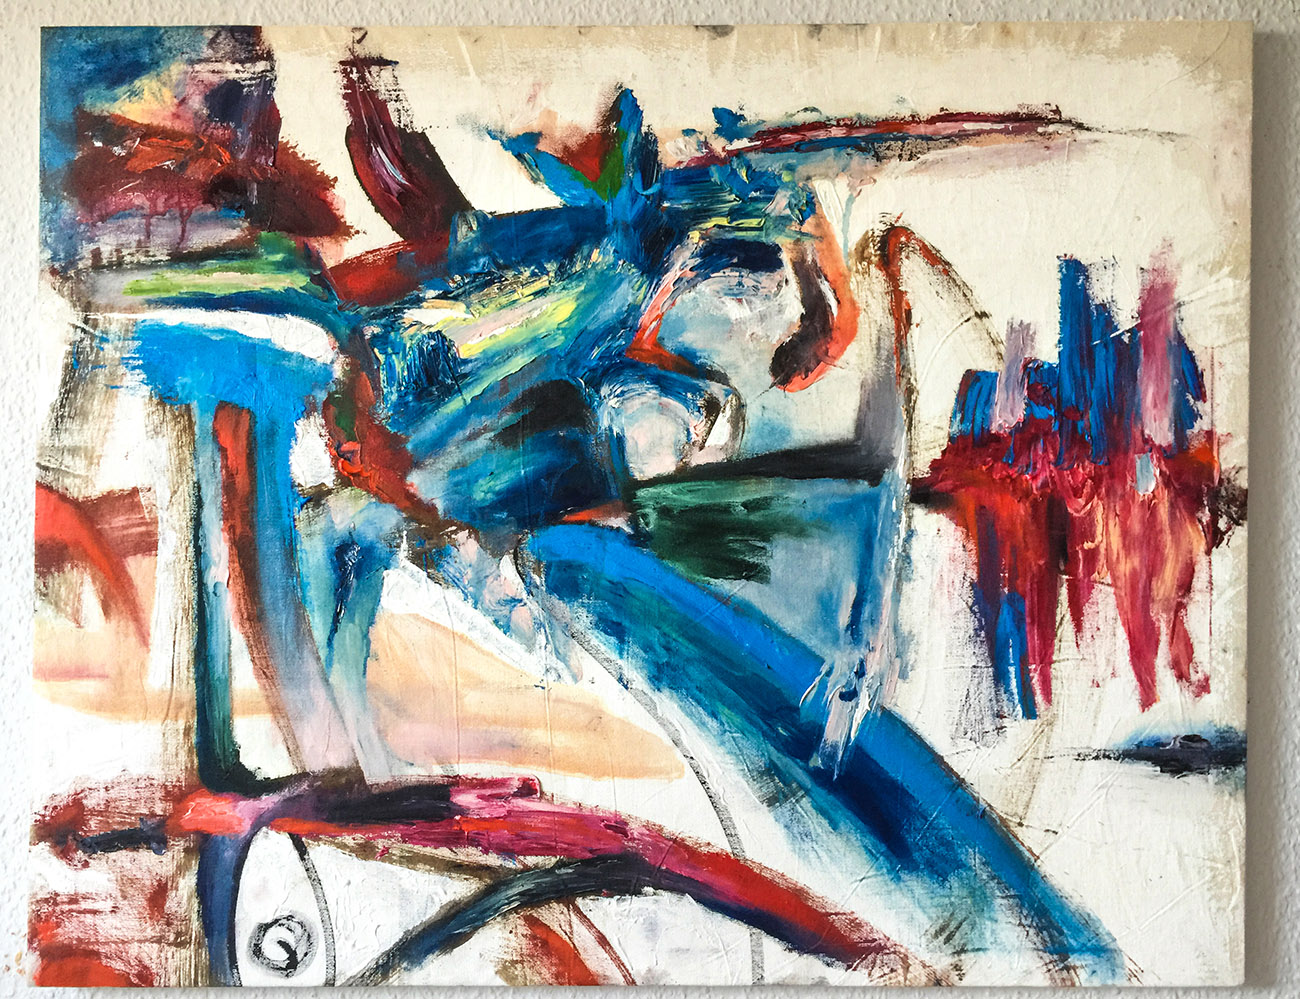 "Intuitive Kunst ""Sonderling"" Künstler Tilarids - Oleg Permeacov, 92x73, Öl auf Cotton, 01.2018 Kunst Gemälde online kaufen, Künstler Bilder, Original Gemälde, Künstler Bilder kaufen"